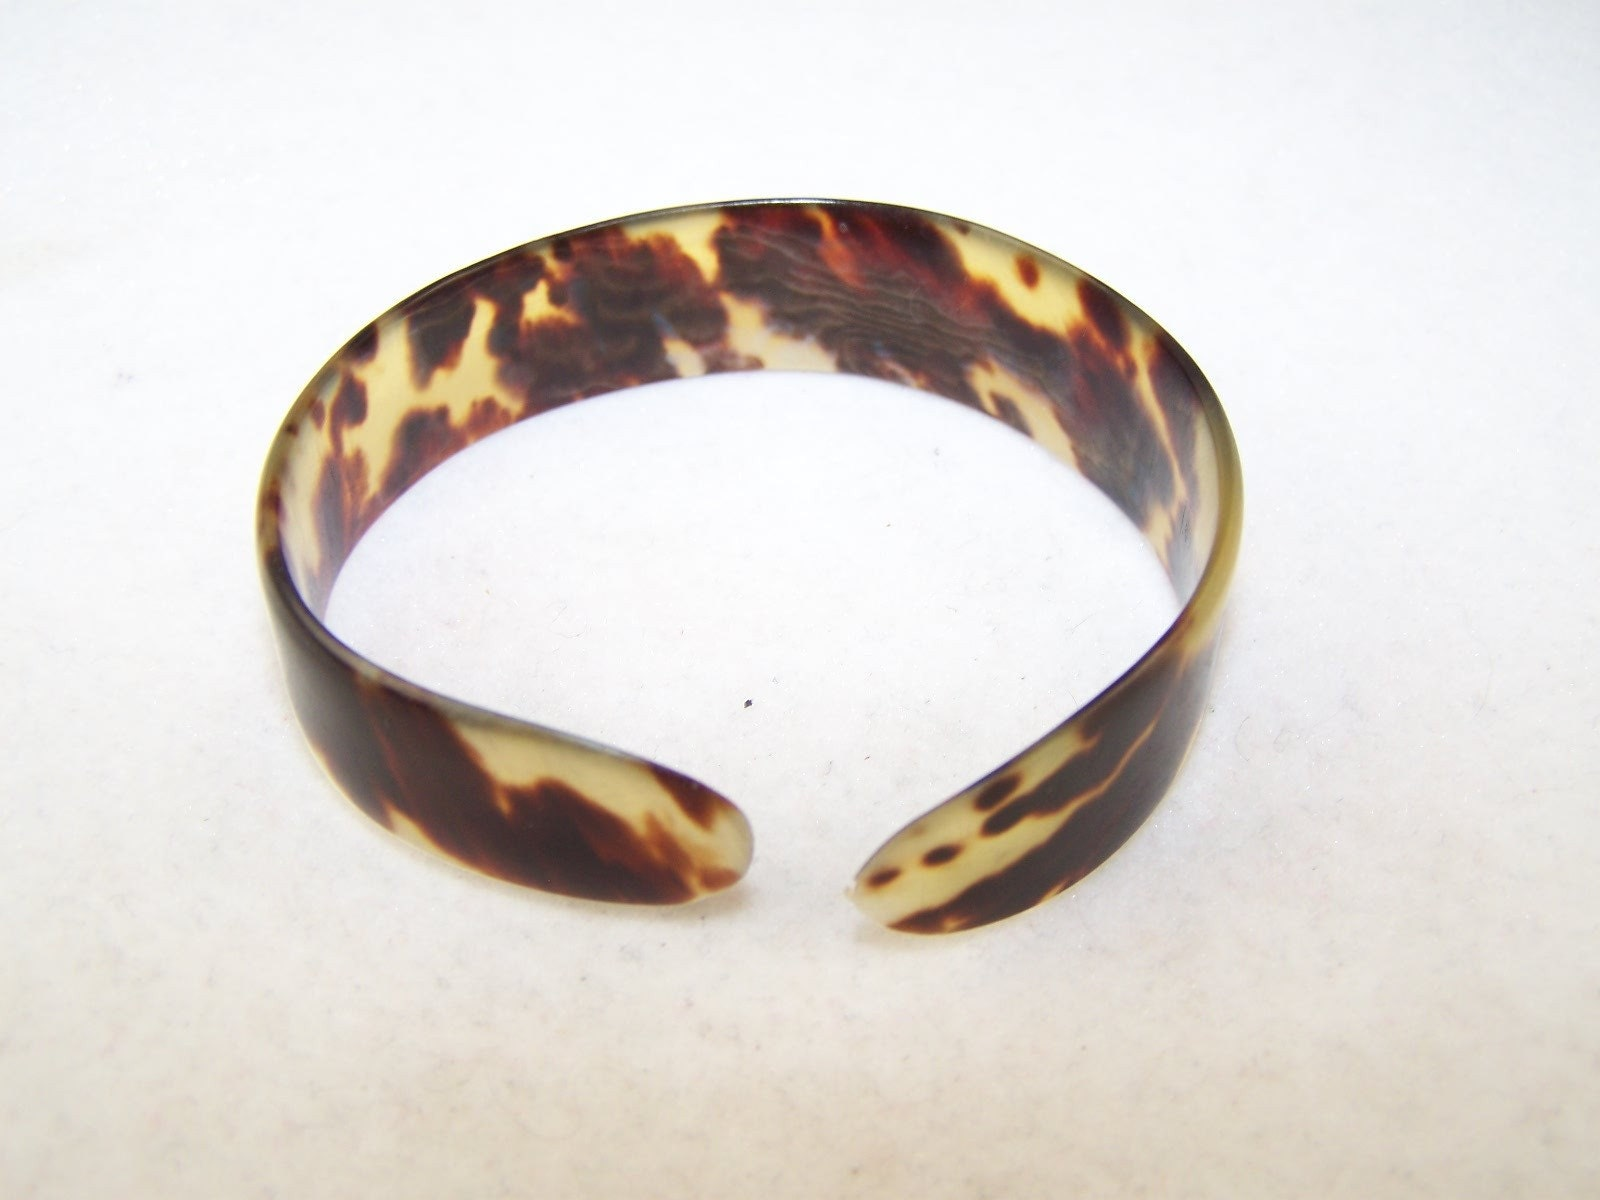 vintage old real tortoise shell cuff bangle bracelet